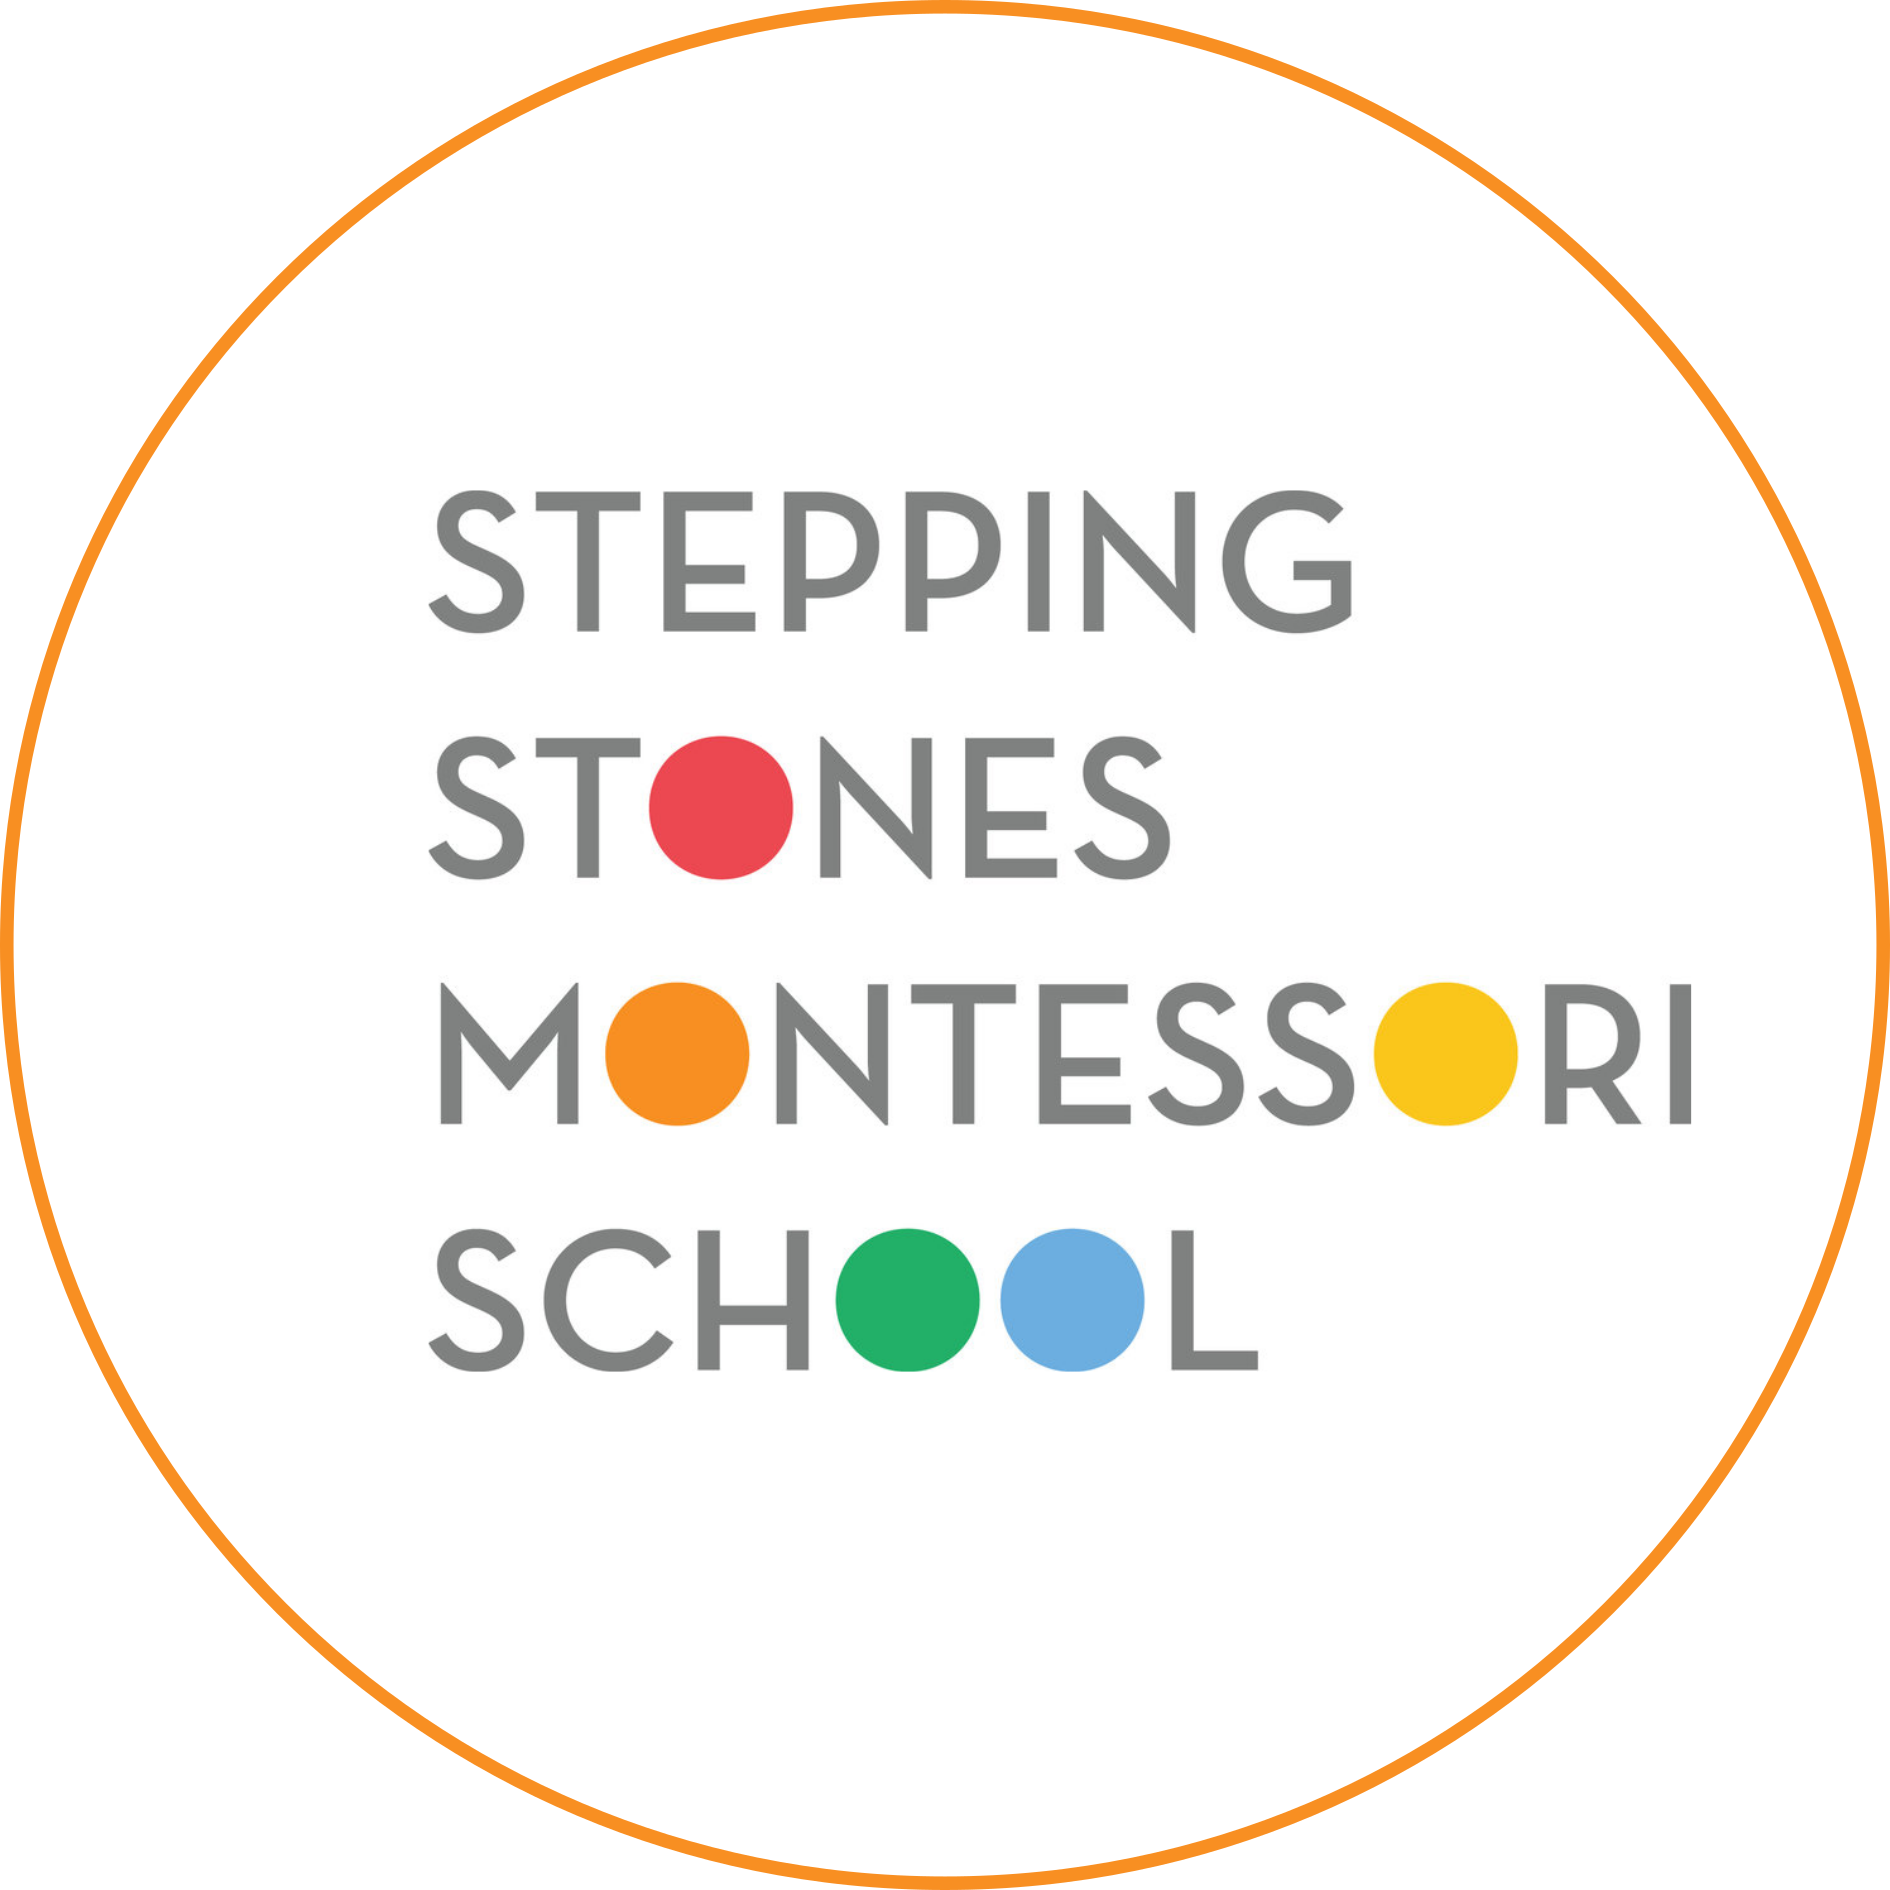 Stepping Stones Montessori School - Grand Rapids, MichiganFull Member